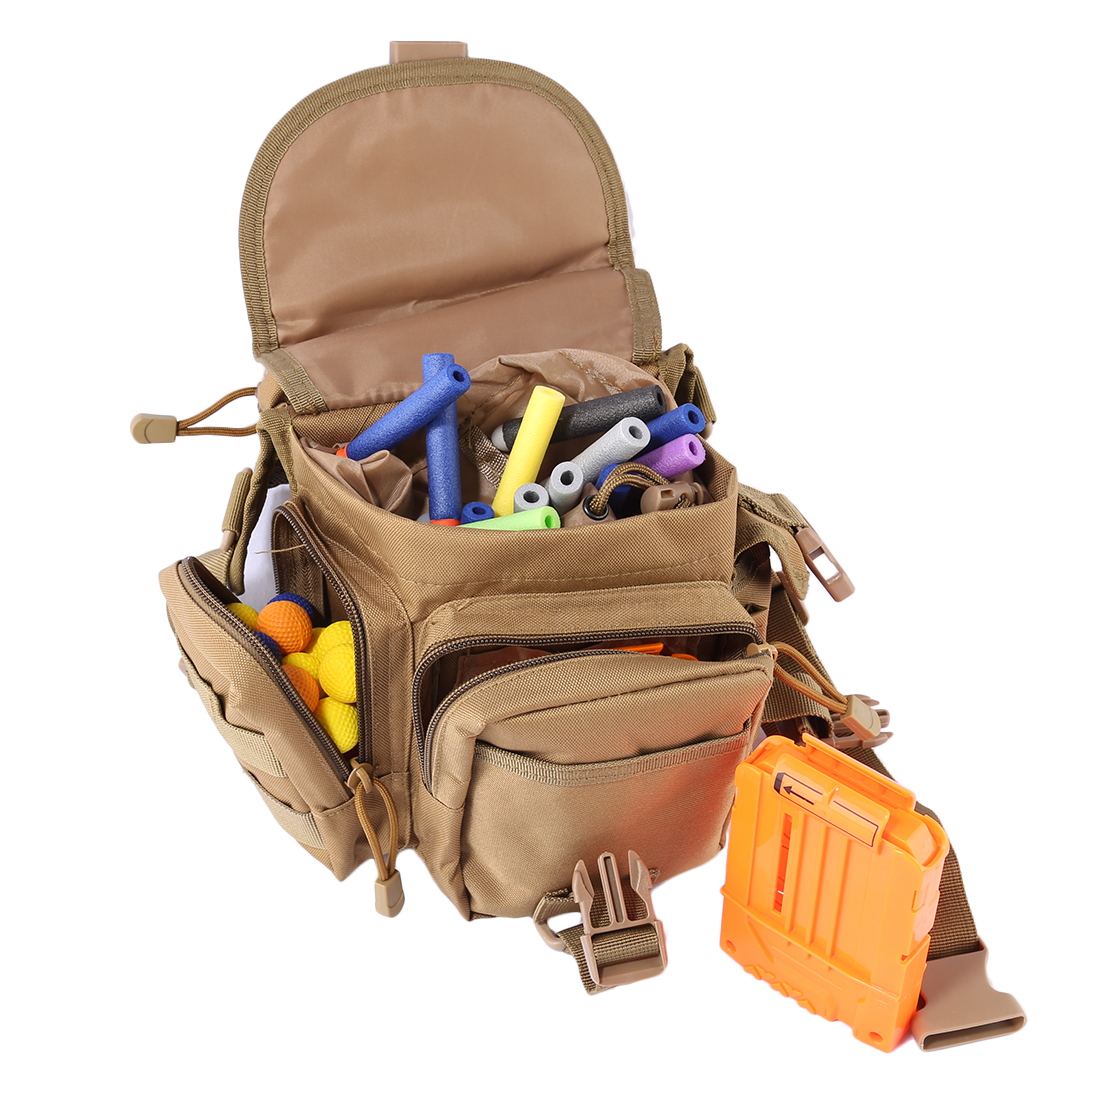 a50107c08e High-end Multi-fuction Τσάντες κυνηγιού Υπαίθρια αθλητική τσάντα ...